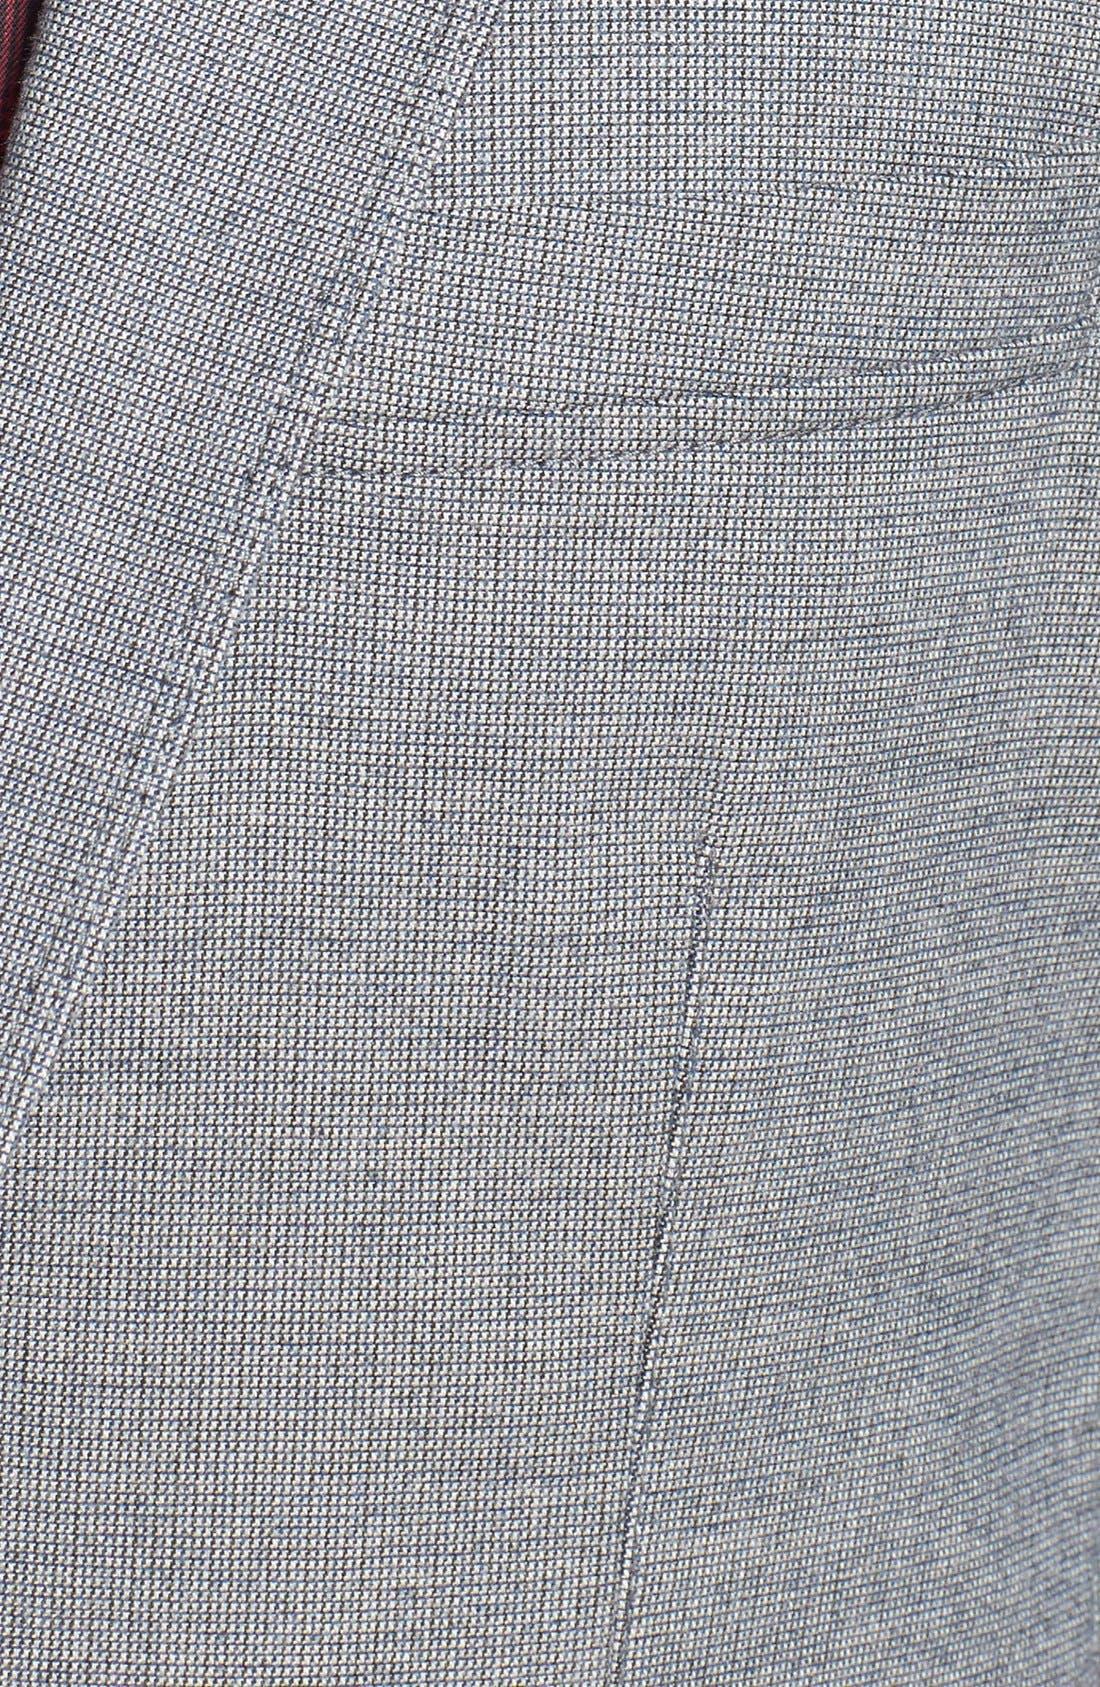 Alternate Image 2  - BOSS HUGO BOSS 'Morell' Regular Fit Blazer